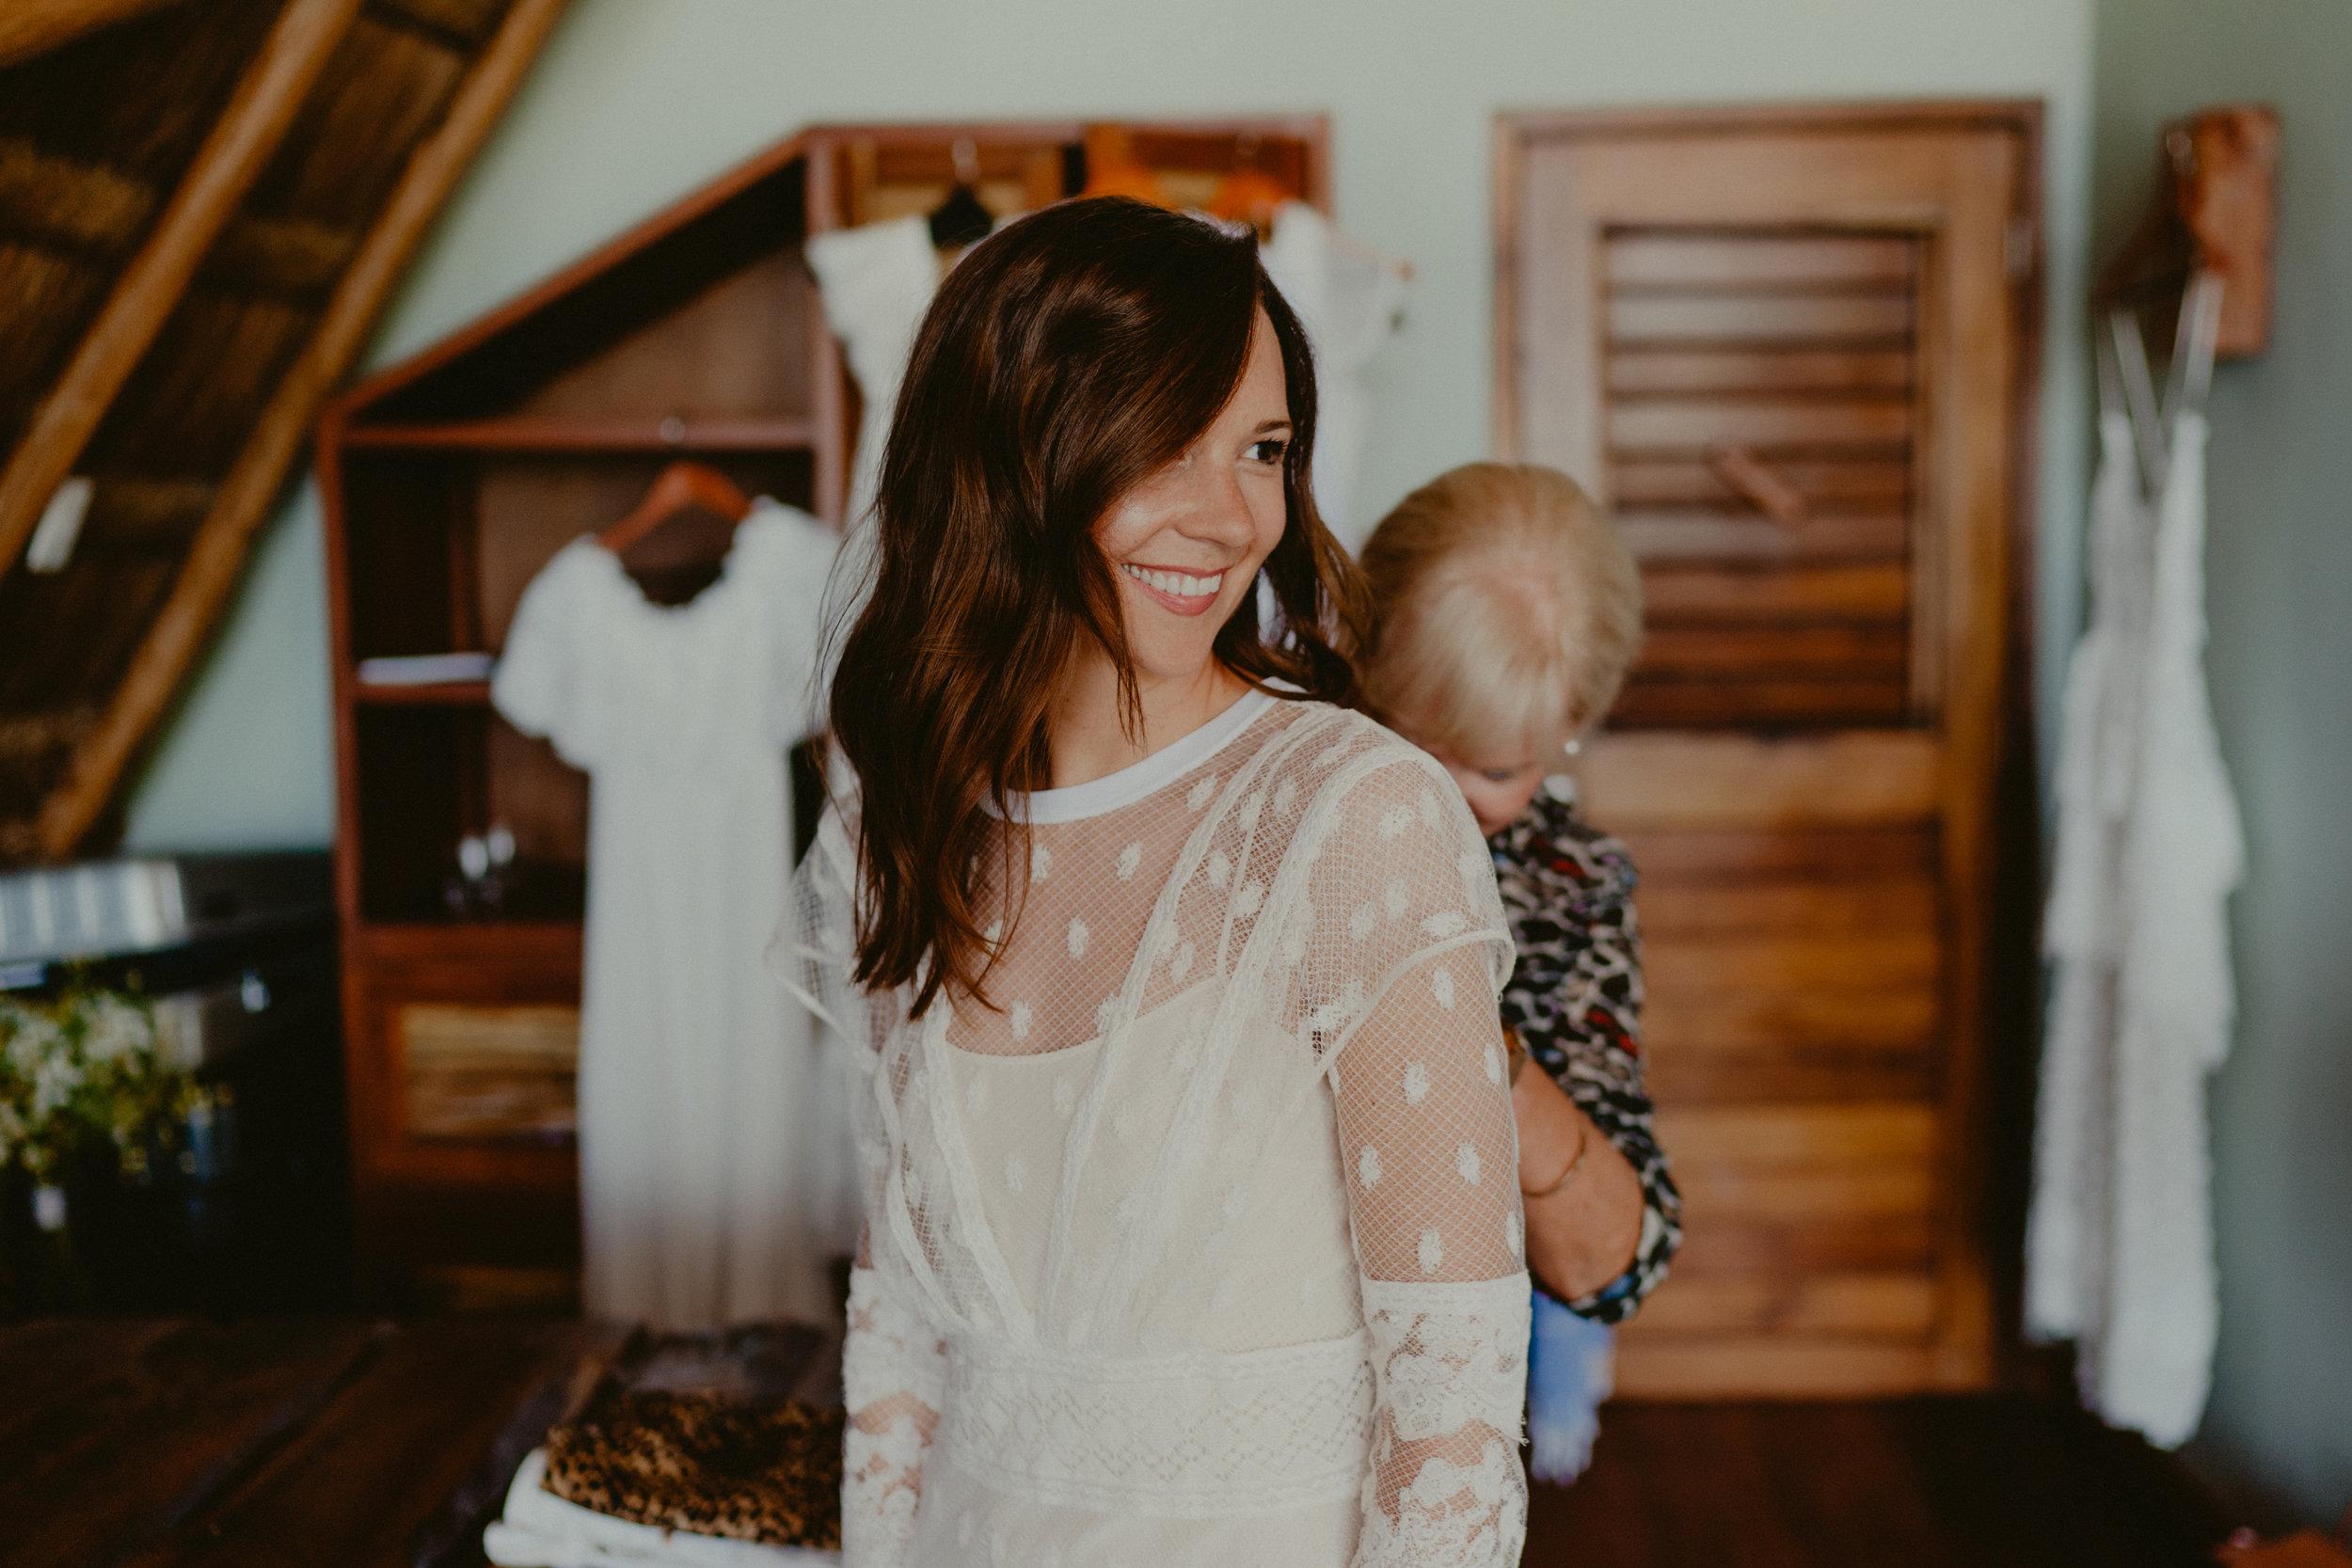 Joanna-and-Cameron_Ahua_Tulum_Wedding_Chellise_MIchael-Photography-82.jpg